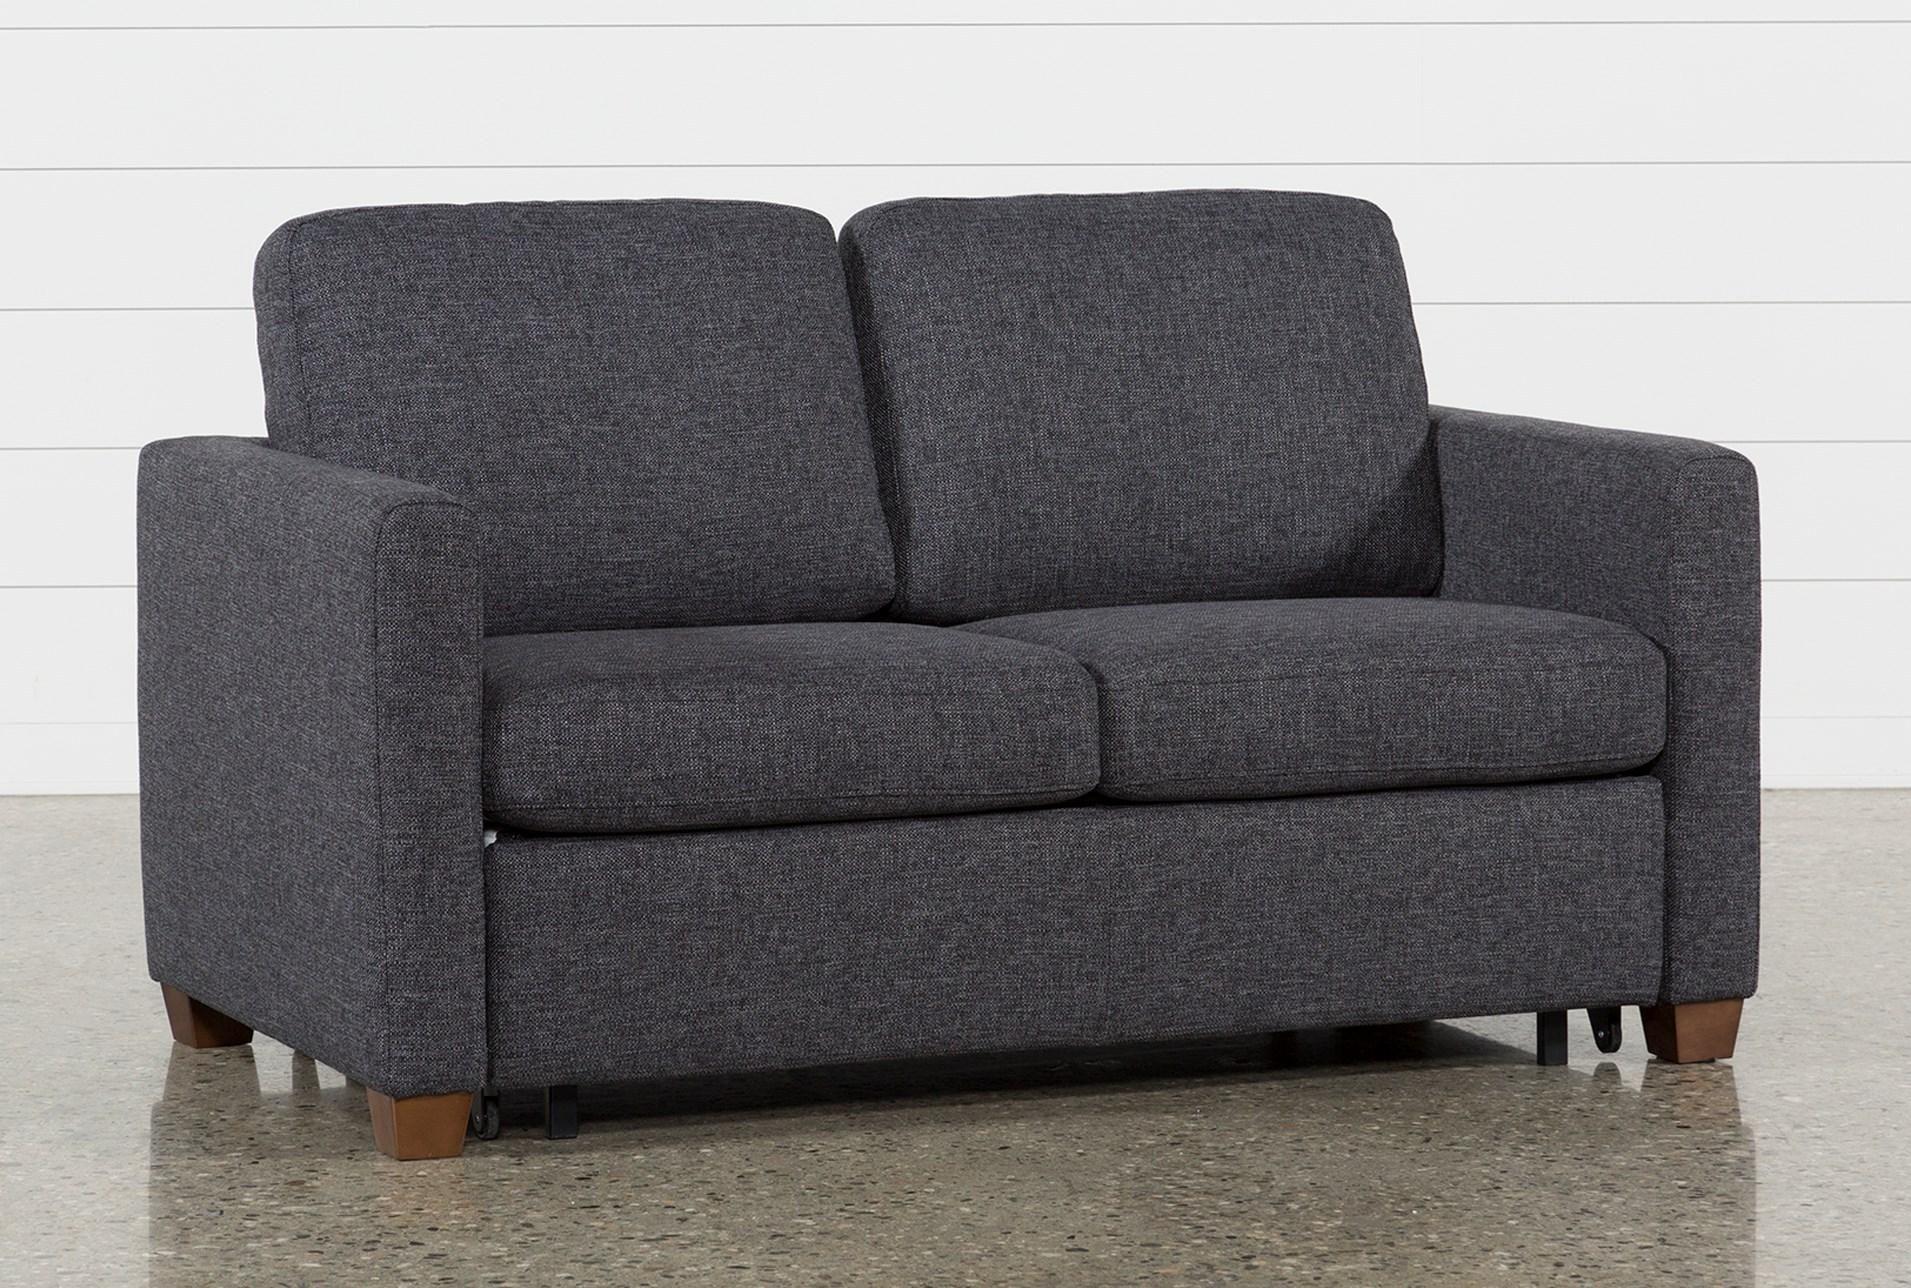 - Cliff Full Sleeper Loveseat Sleeper, Small Sleeper Sofa